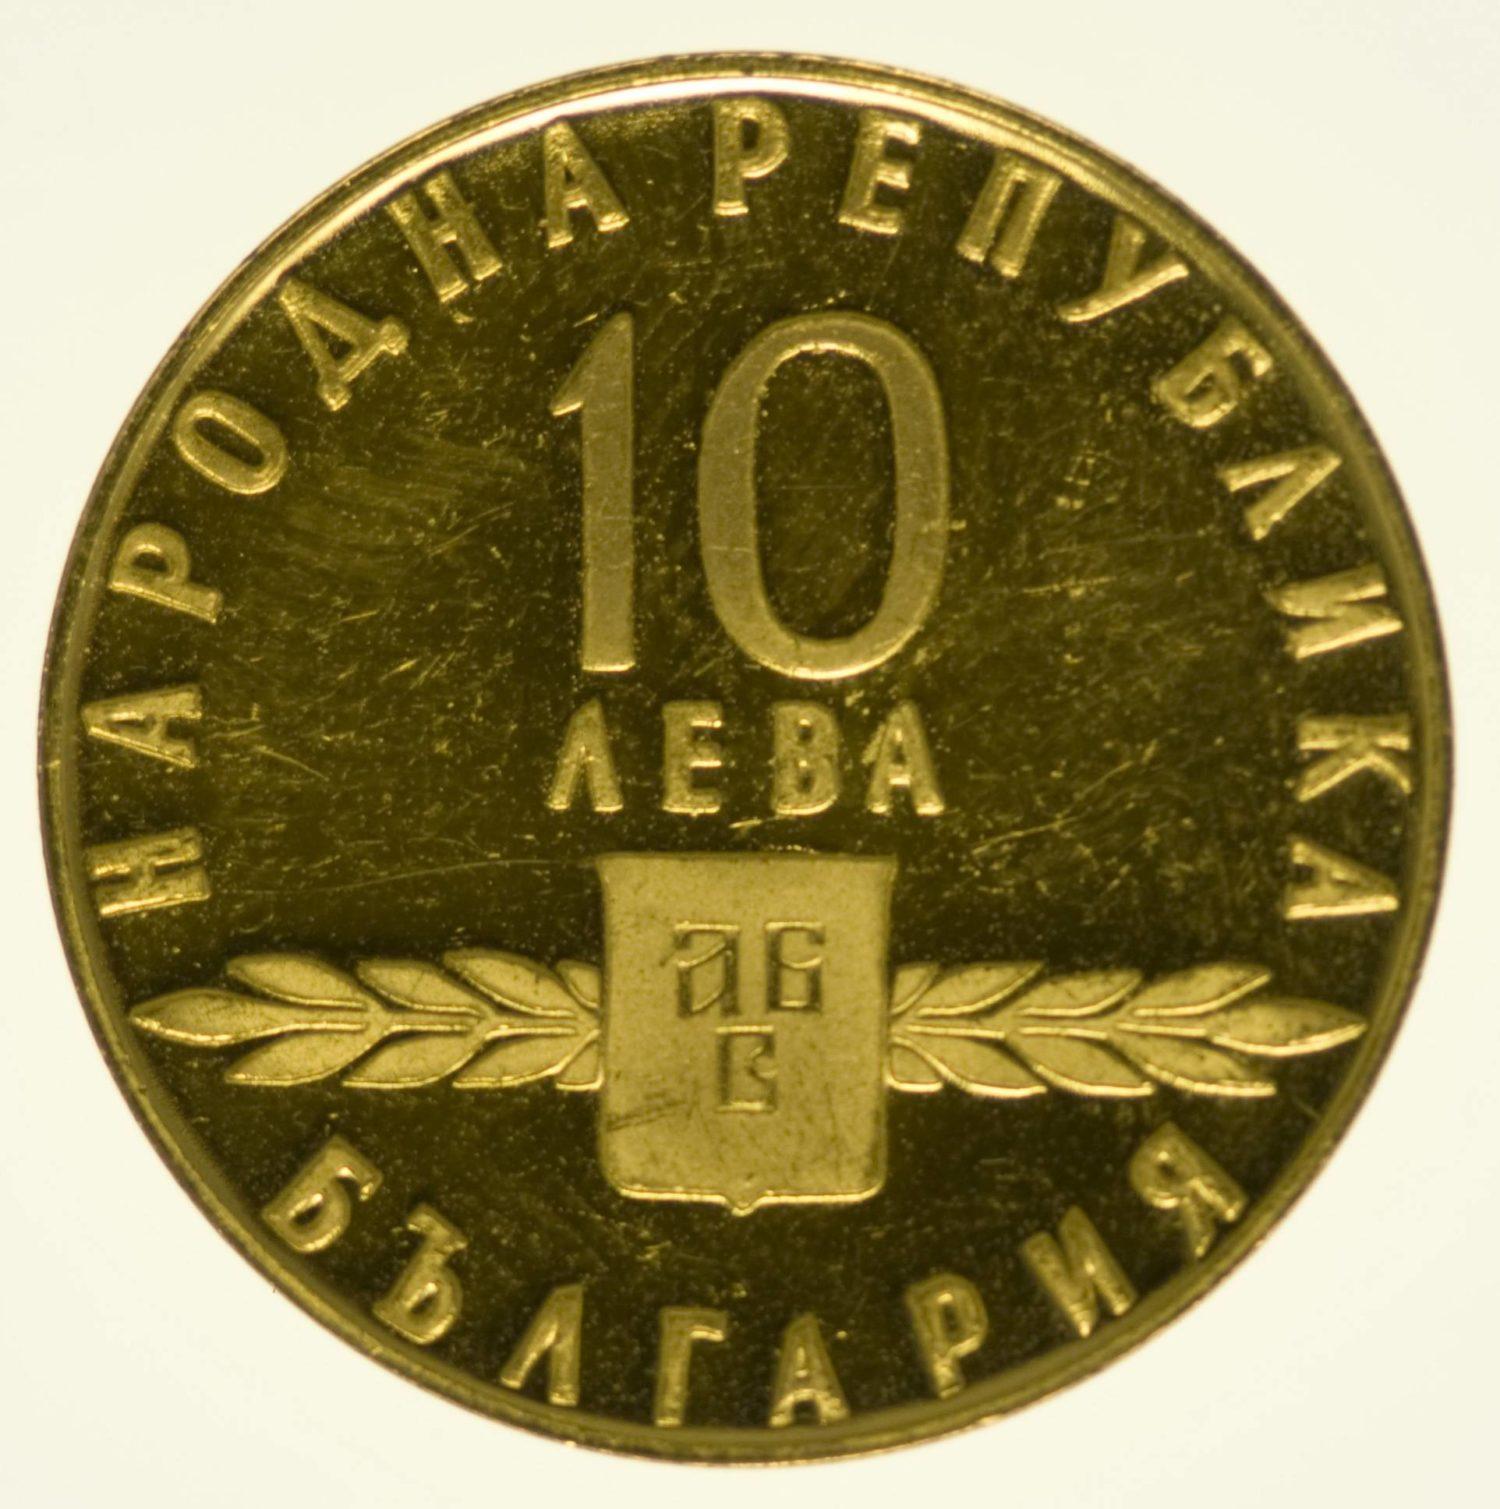 Bulgarien 10 Lewa 1963 PP Jubil. Slawisches Schrifttum Gold 7,60 Gramm fein RAR